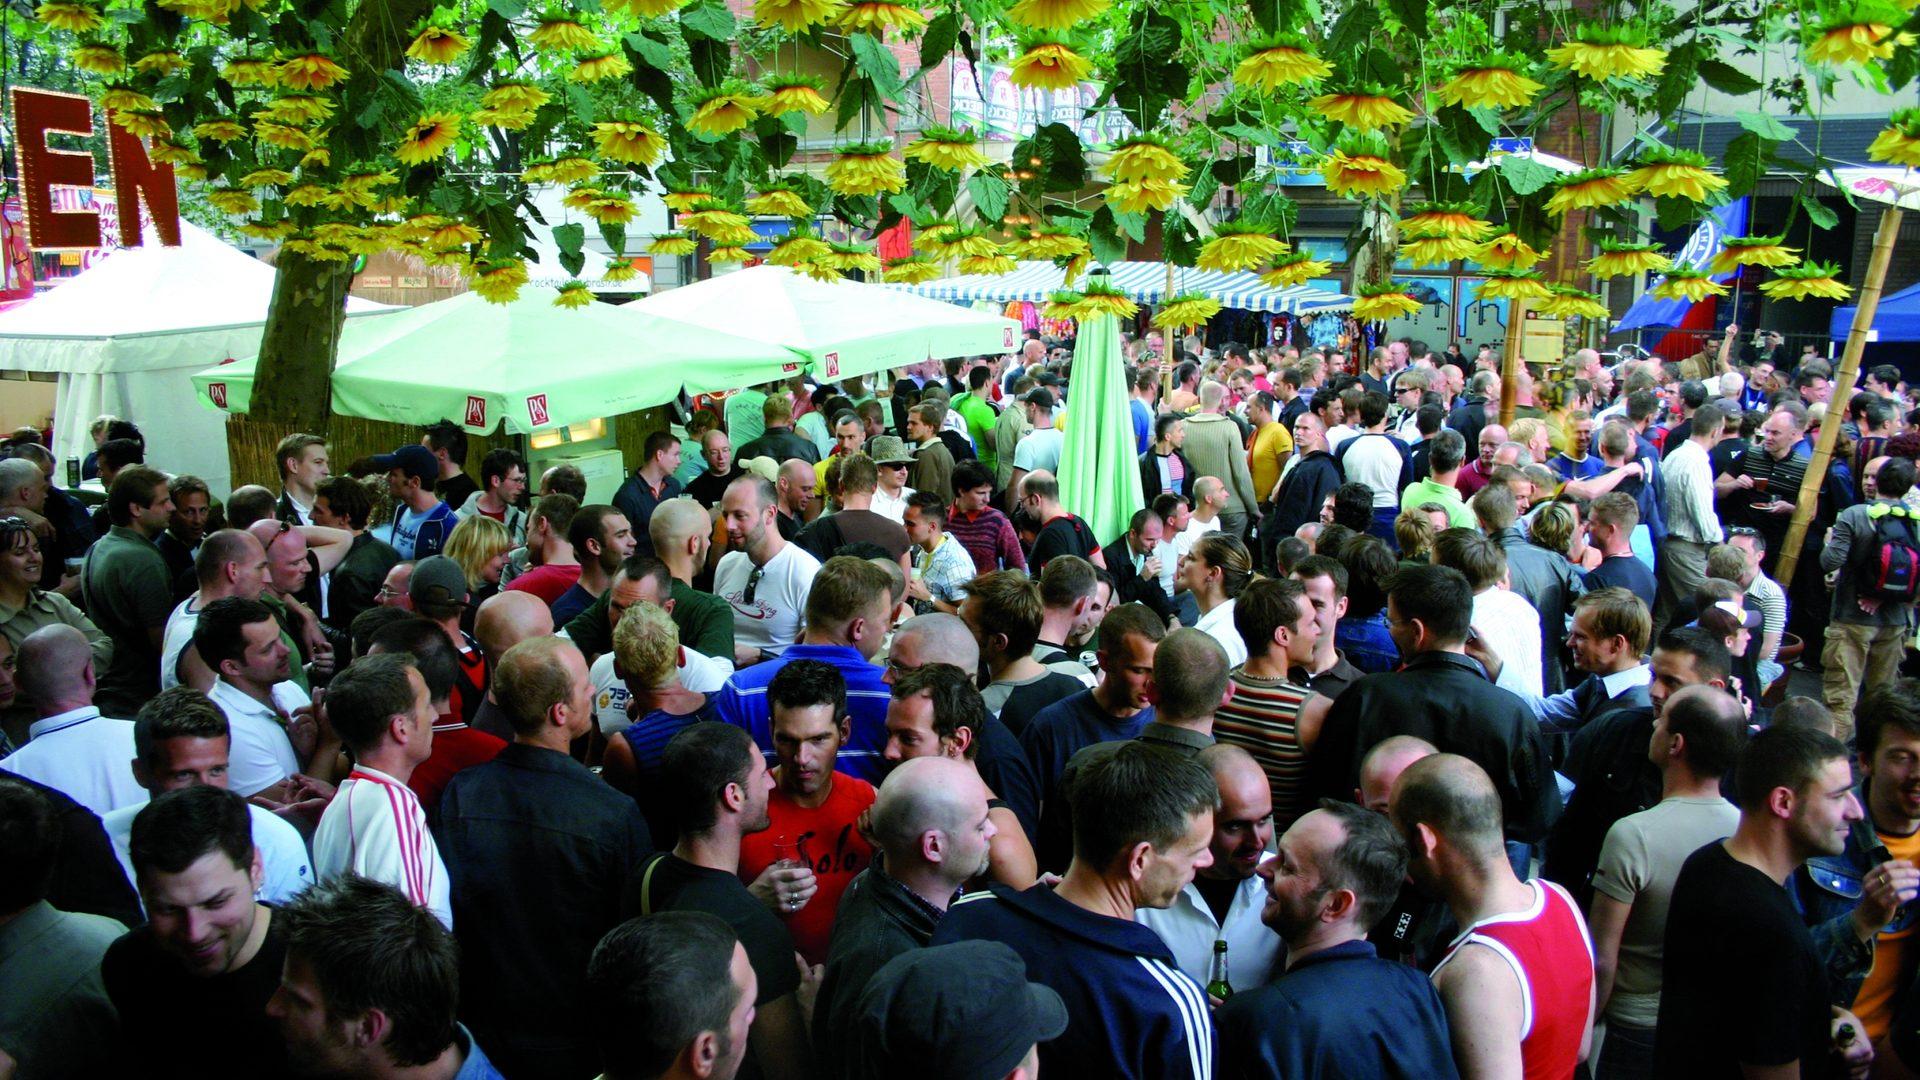 Hafen - Gay Bar in Berlin, Schöneberg   Flokkr